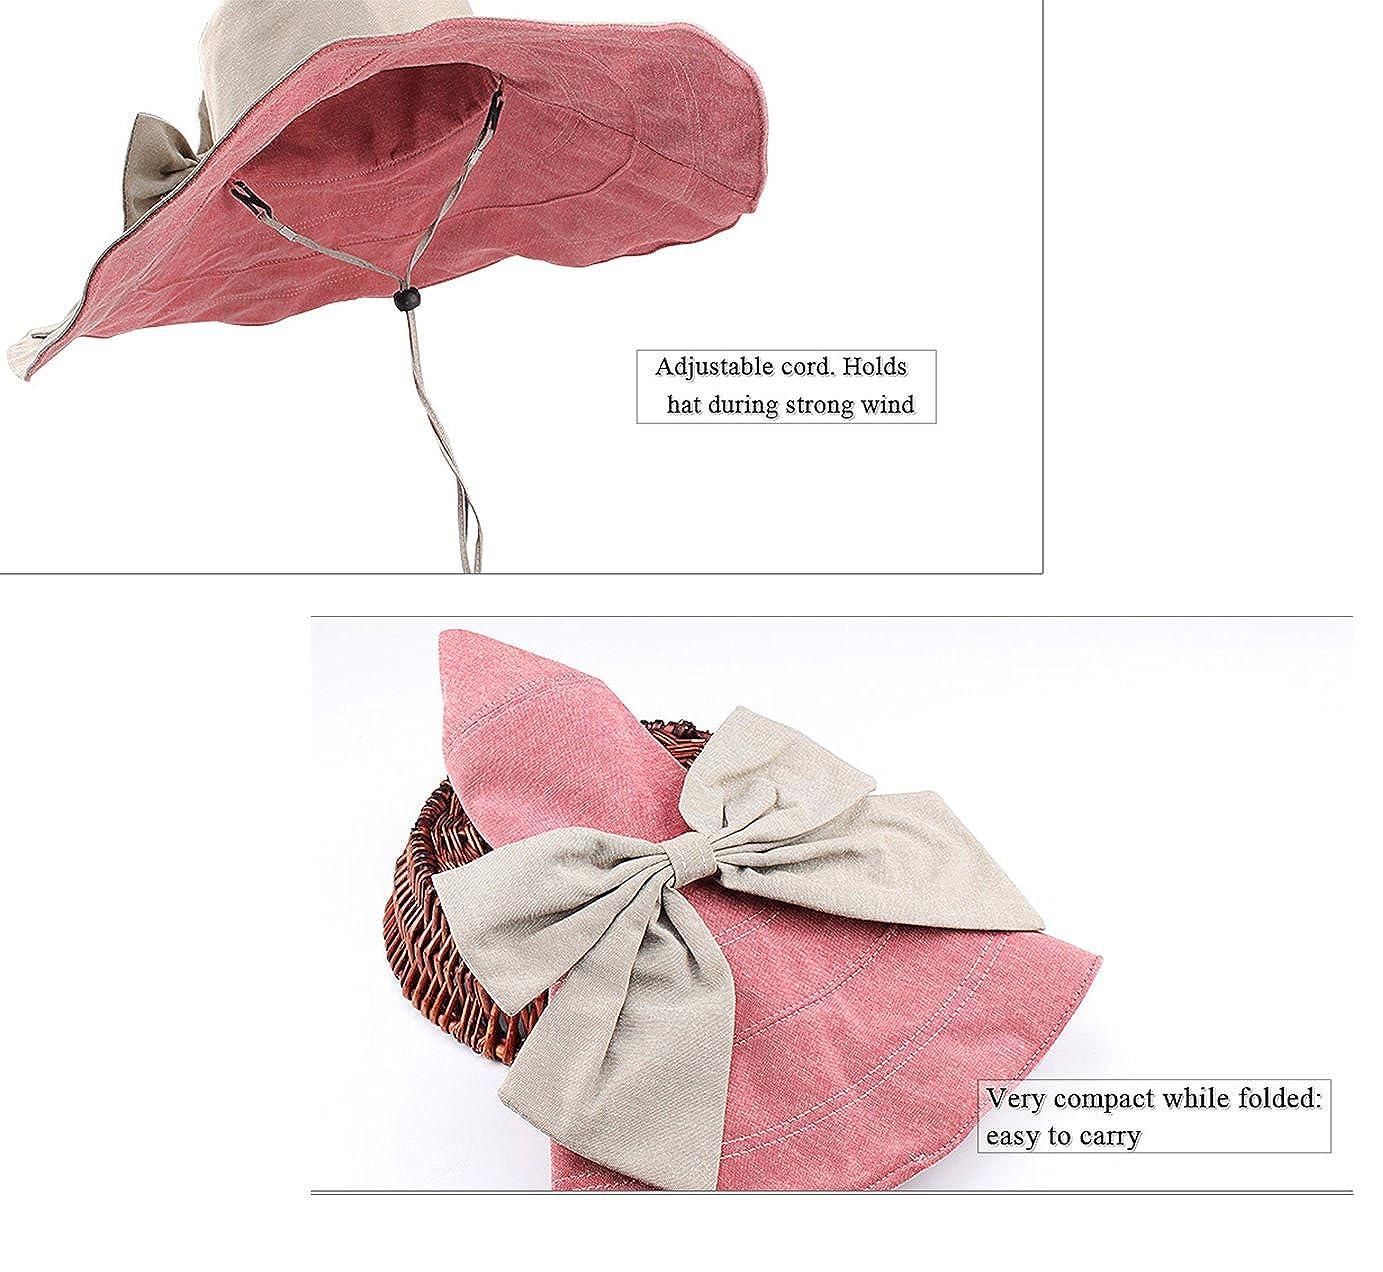 RIONA Damen Frauen breite gro/ße Brim Sonnenhut Reversible Floppy Sun H/üte Foldable Roll up Sommer Strand Anti-UV UPF 50 Sonnenschutz Hut Cap